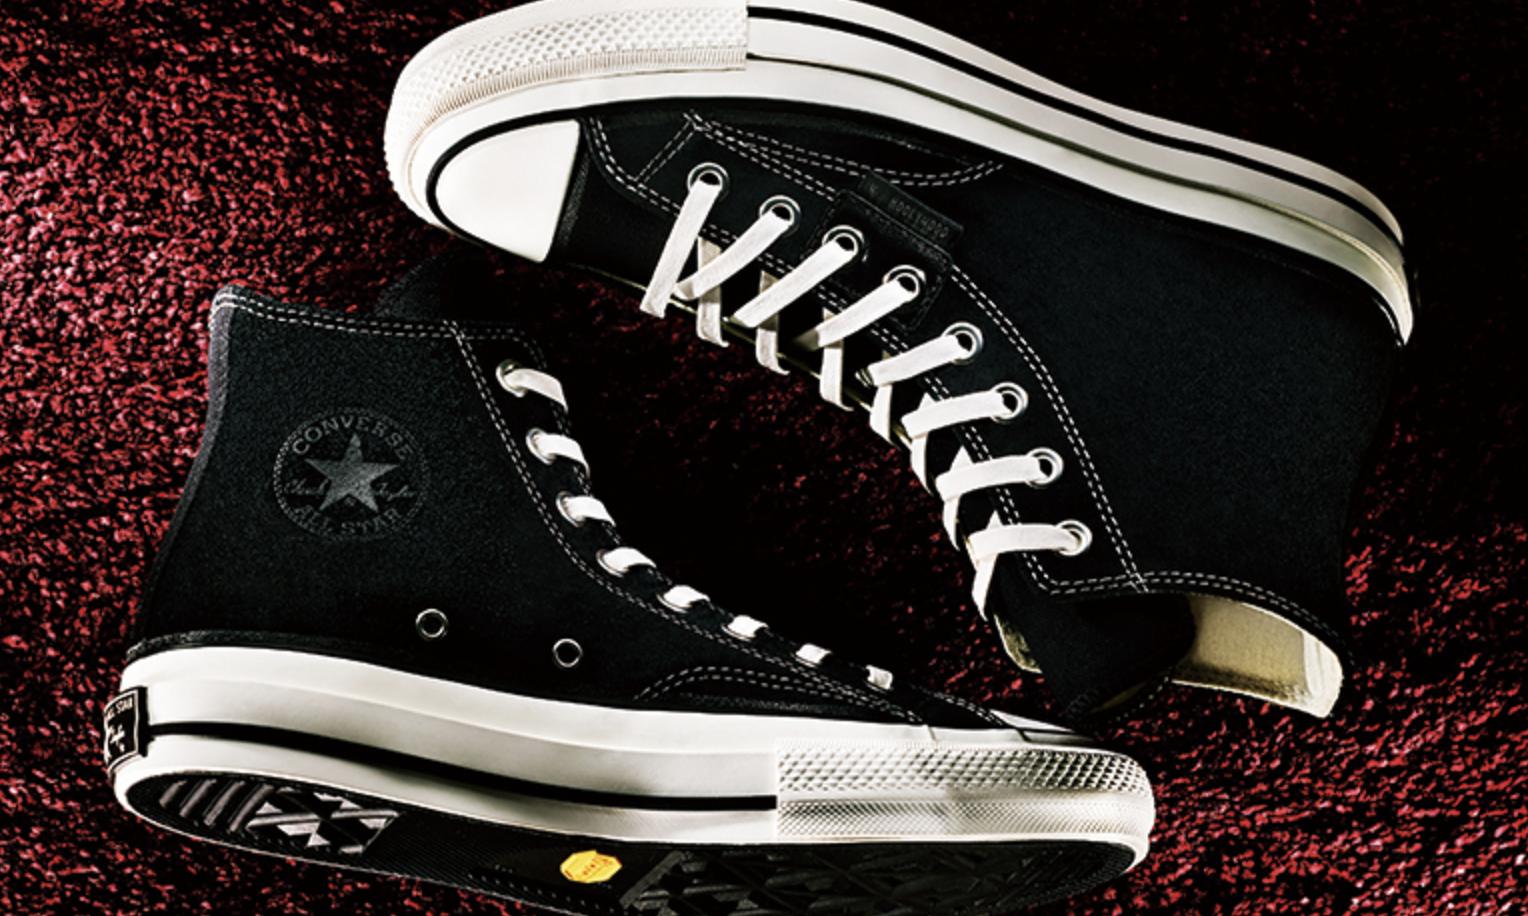 N.HOOLYWOOD x CONVERSE ADDICT 全新联乘鞋款正式登场